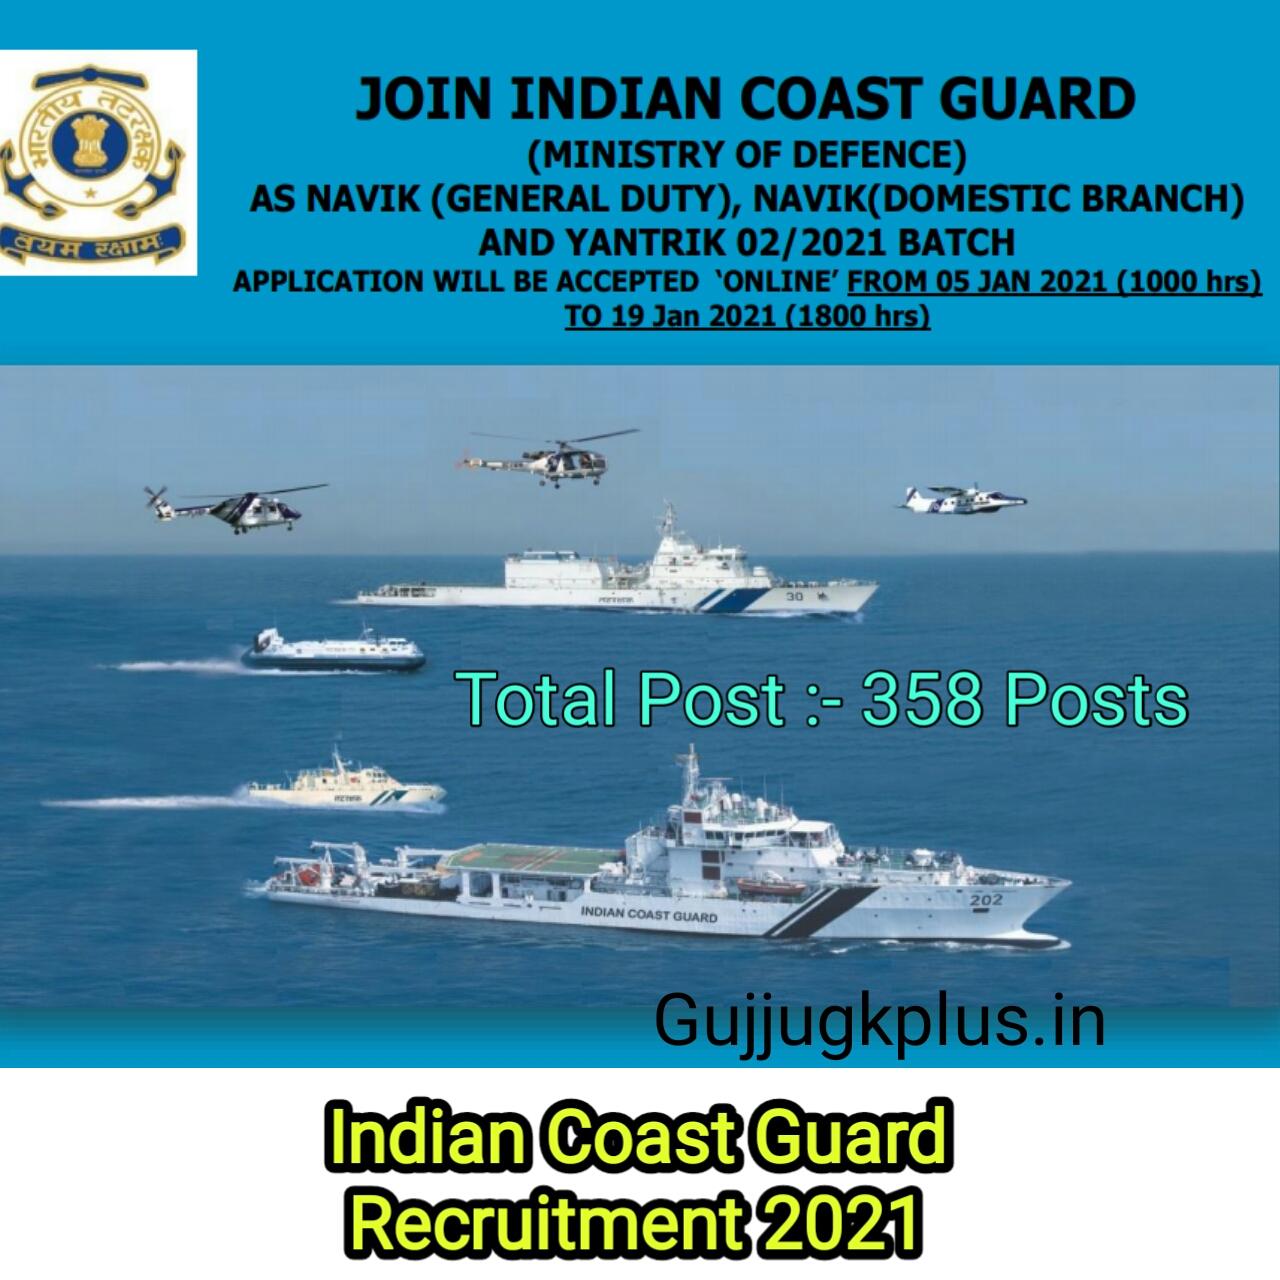 NEW JOBS - Join Indian Coast Guard / Indian Coast Guard Recruitment 2021